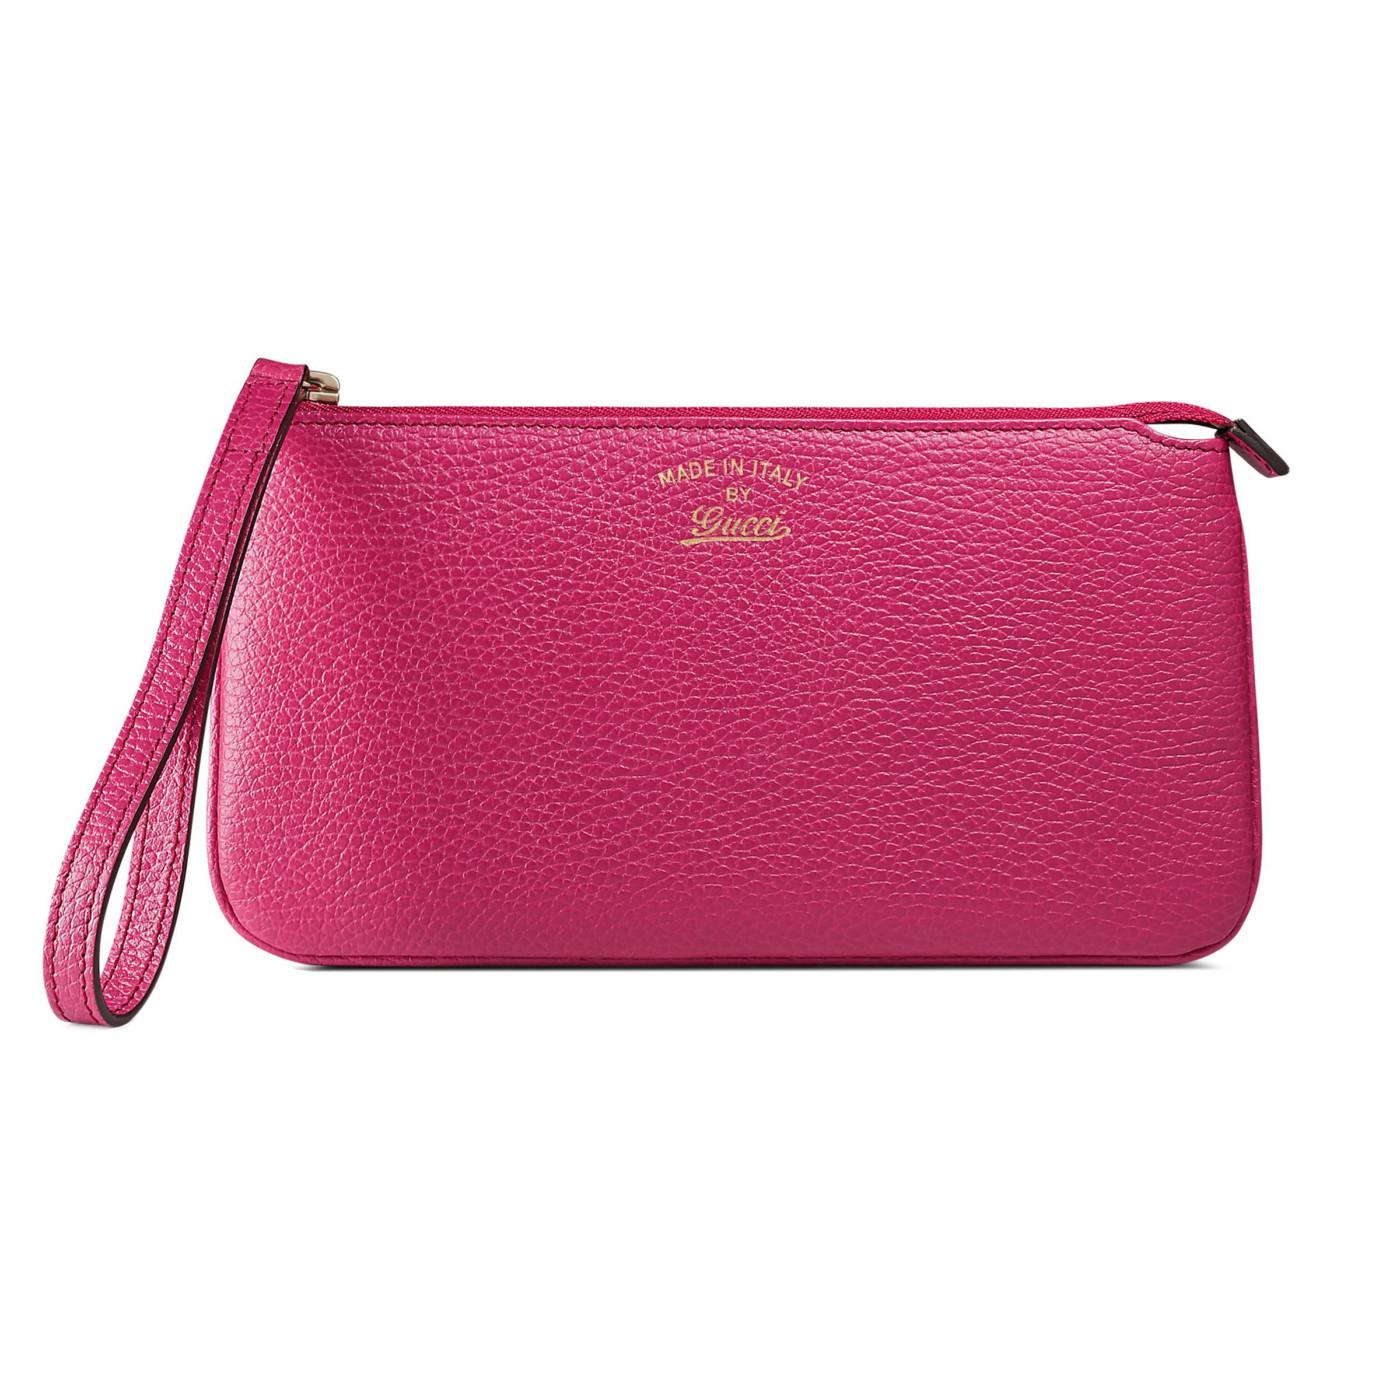 e6c306c2cd69 Gucci Women's Fuchsia Leather Swing Zip Around Wristlet Wallet